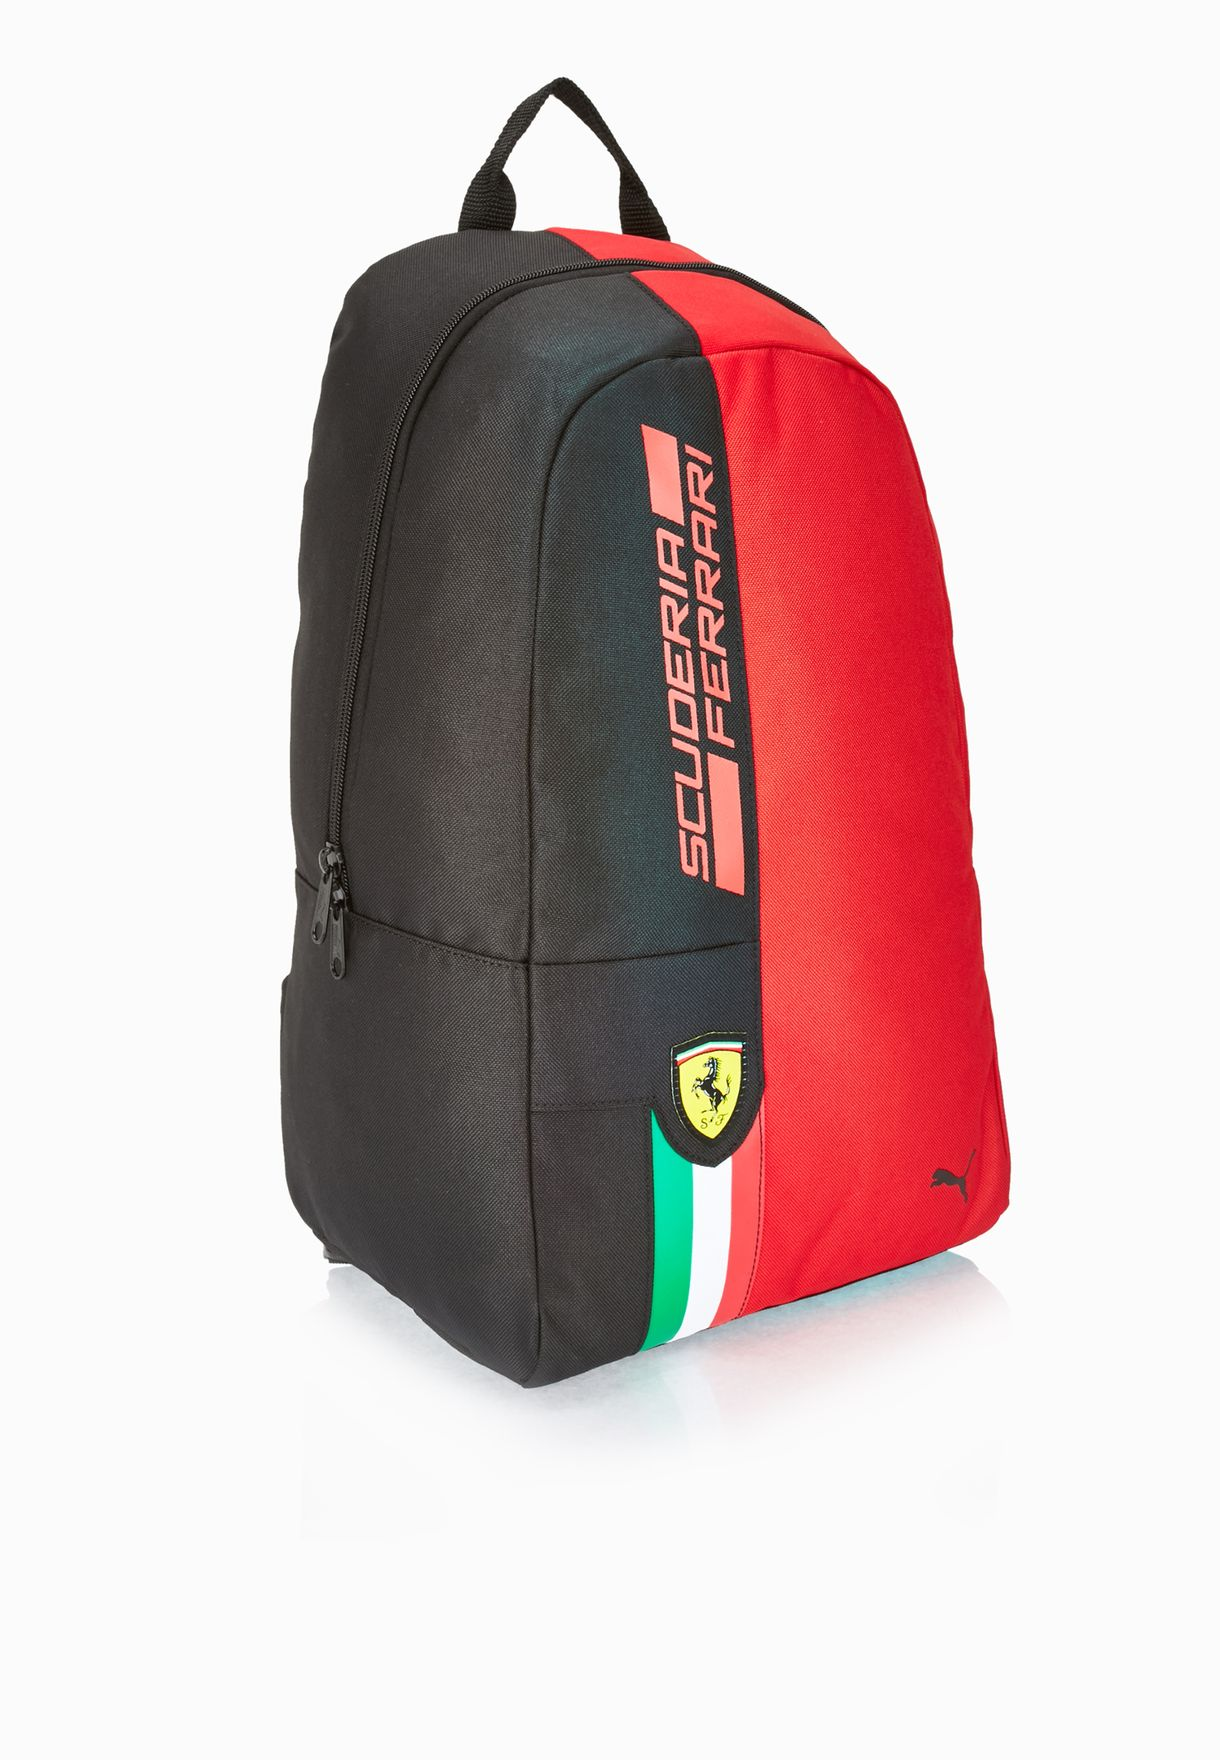 3e94fb668f Shop PUMA red Ferrari Fanwear Backpack 07427301 for Men in UAE ...